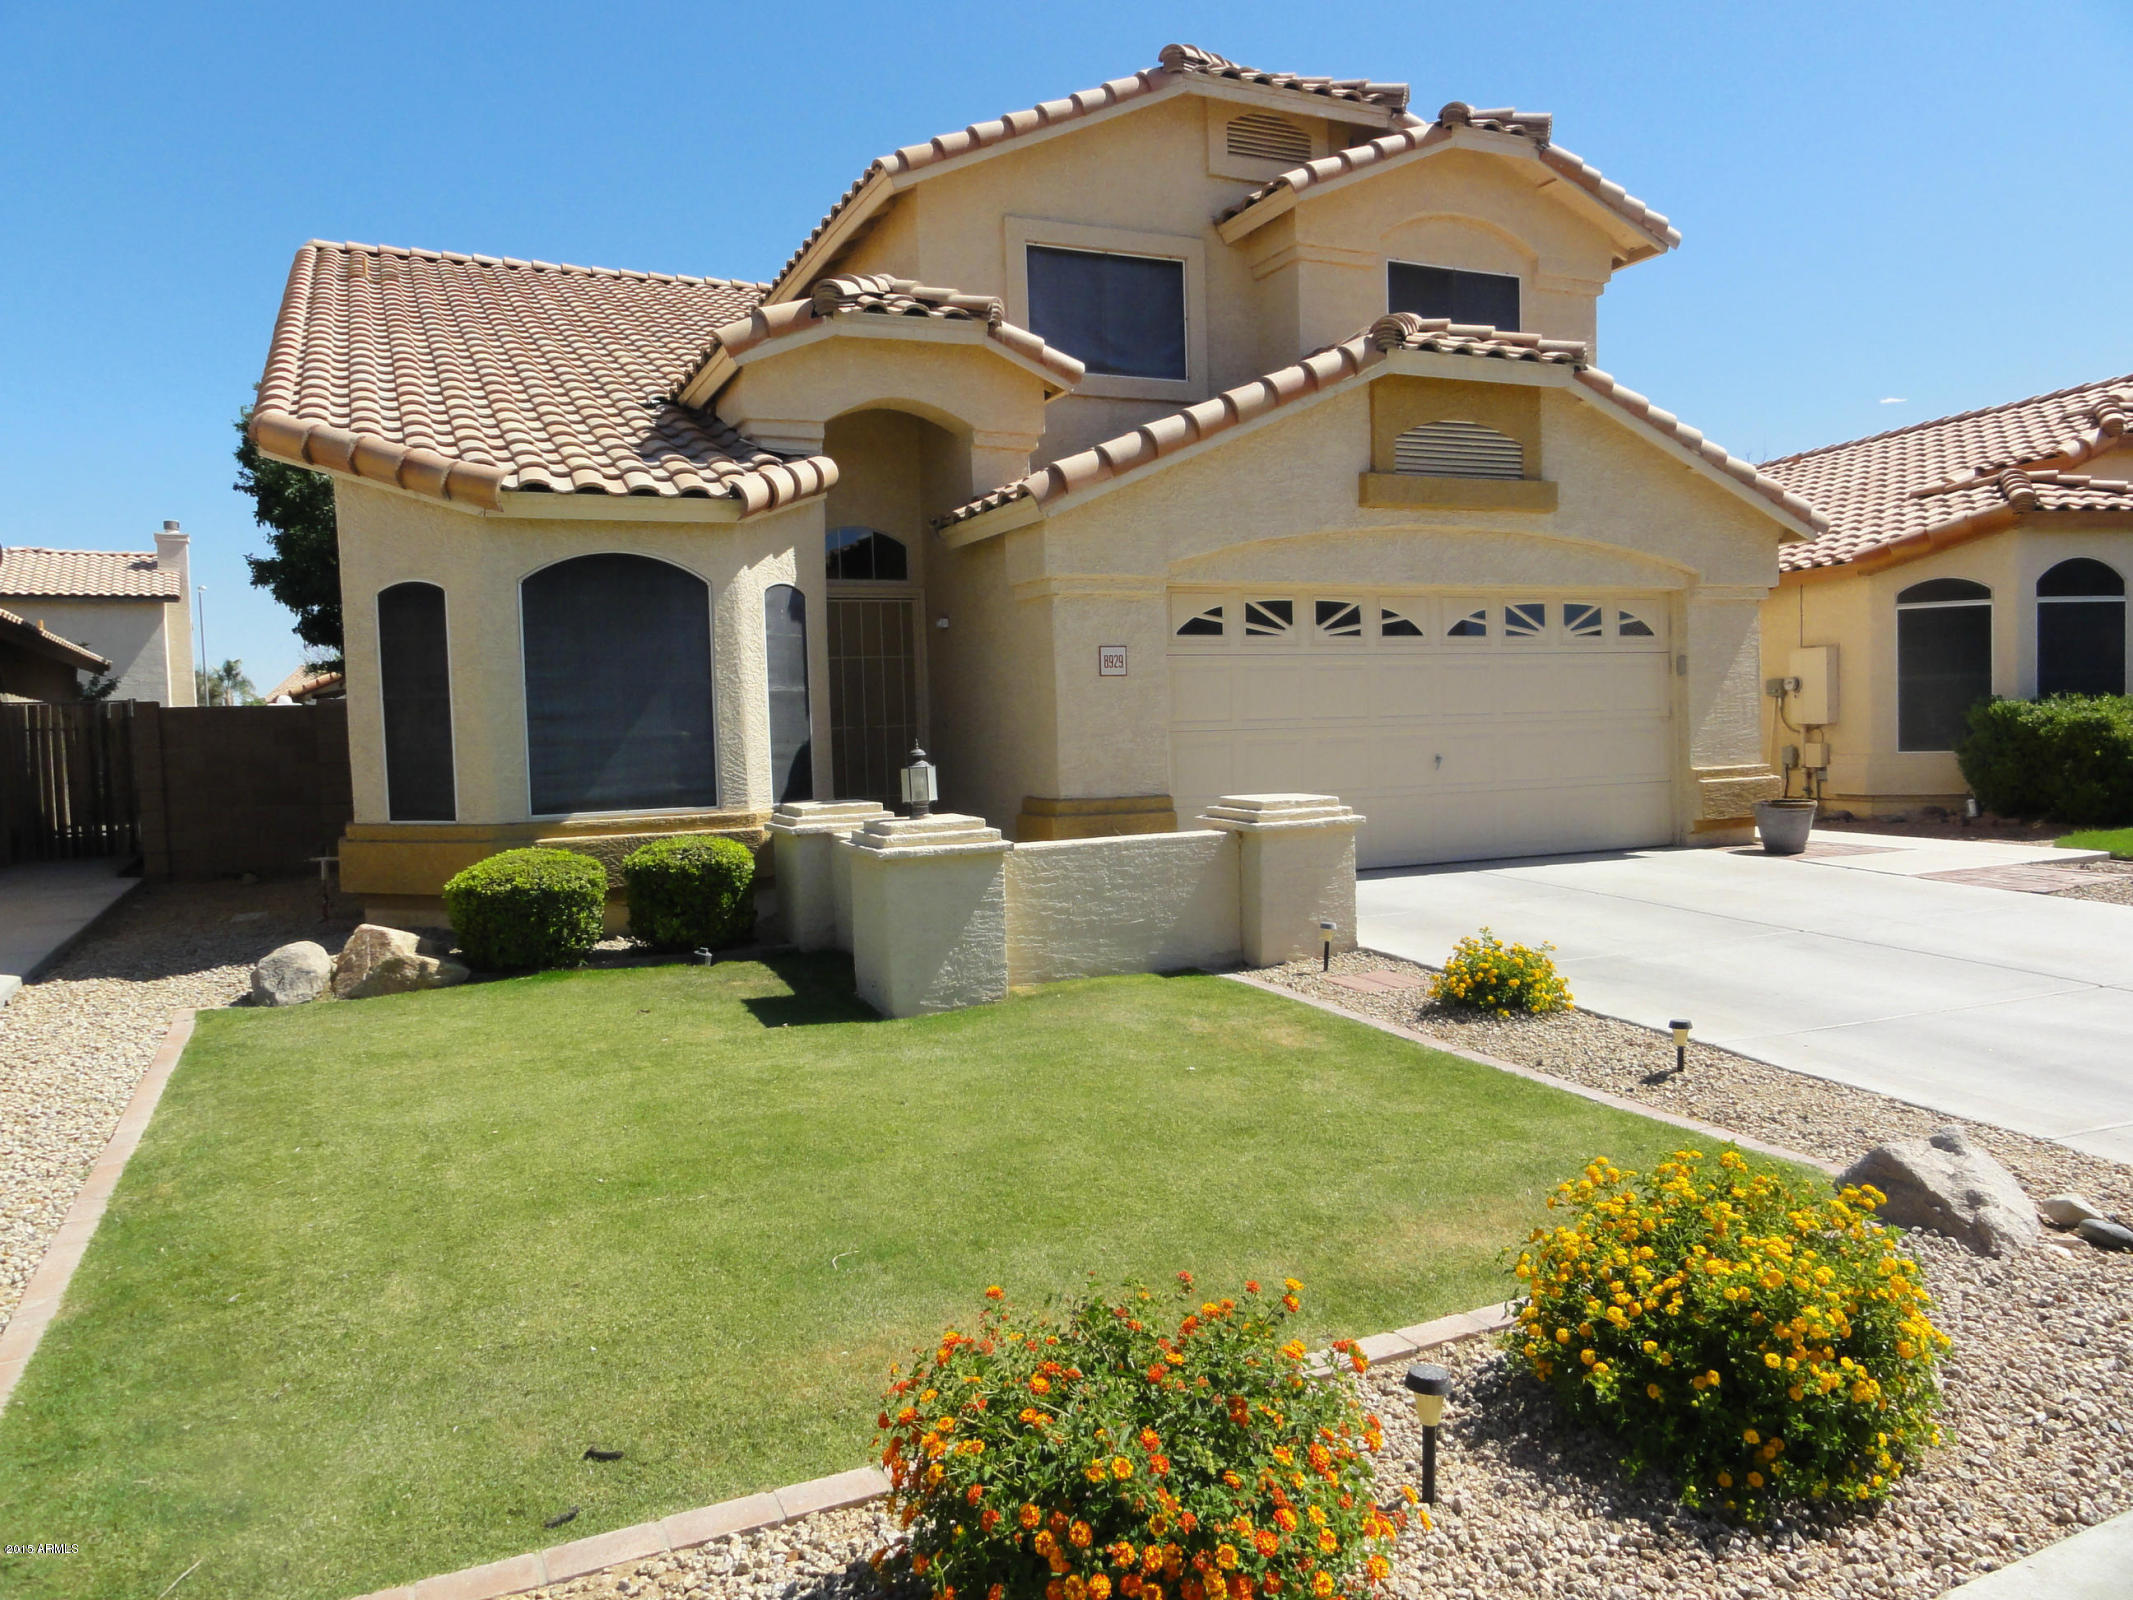 MLS 6082732 Peoria Metro Area, Peoria, AZ 85382 Peoria Homes for Rent